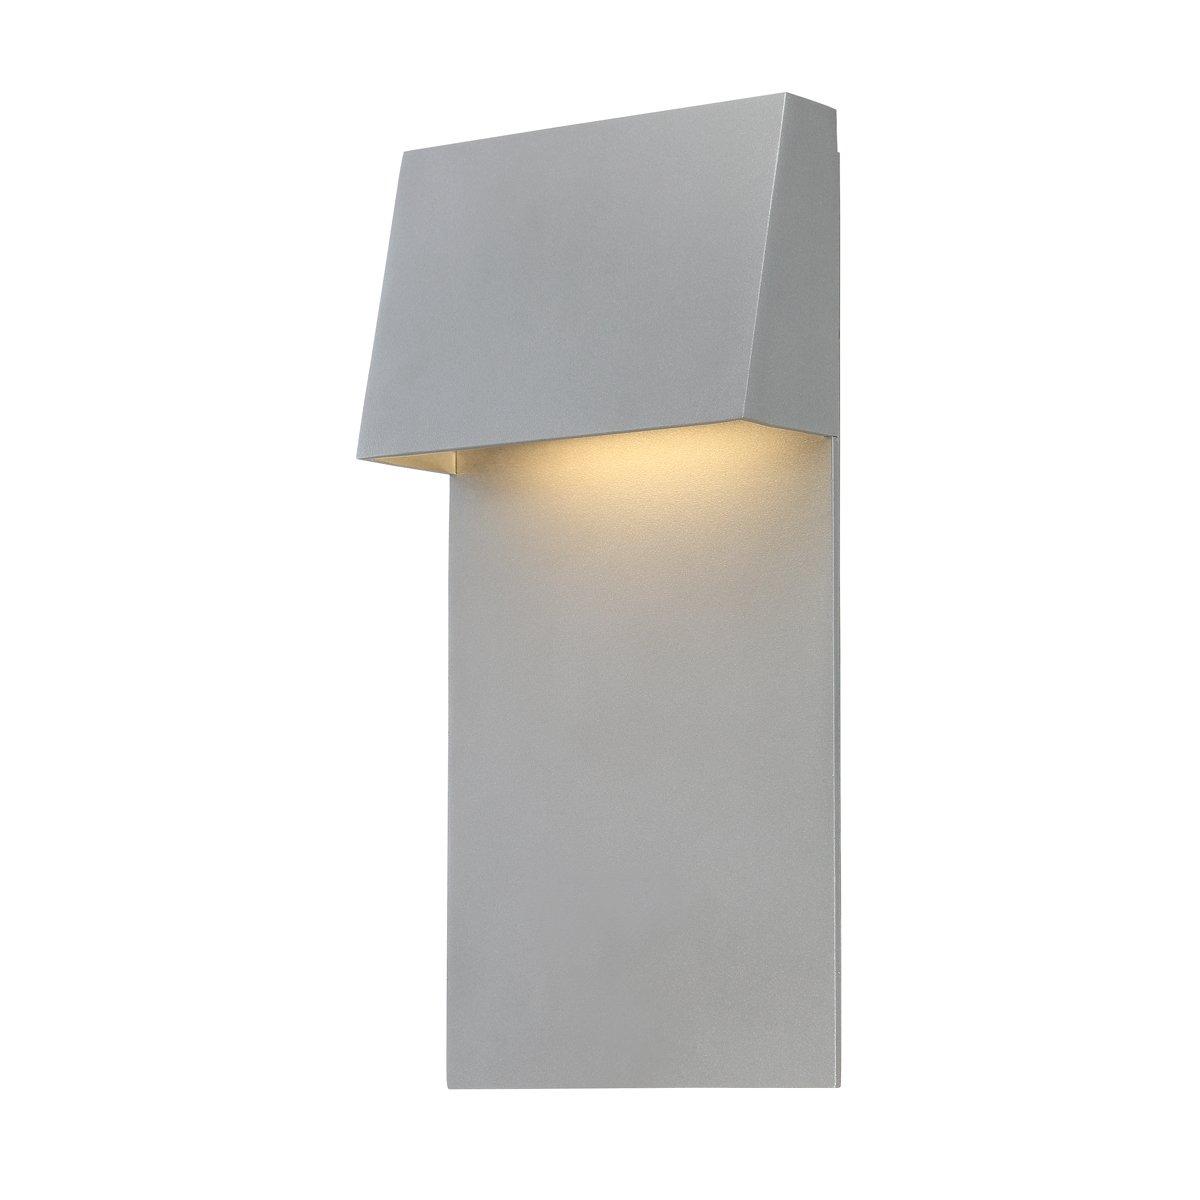 WAC照明ws-w53614 Zealous Singleライト14「高統合LEDアウトドア壁、 14